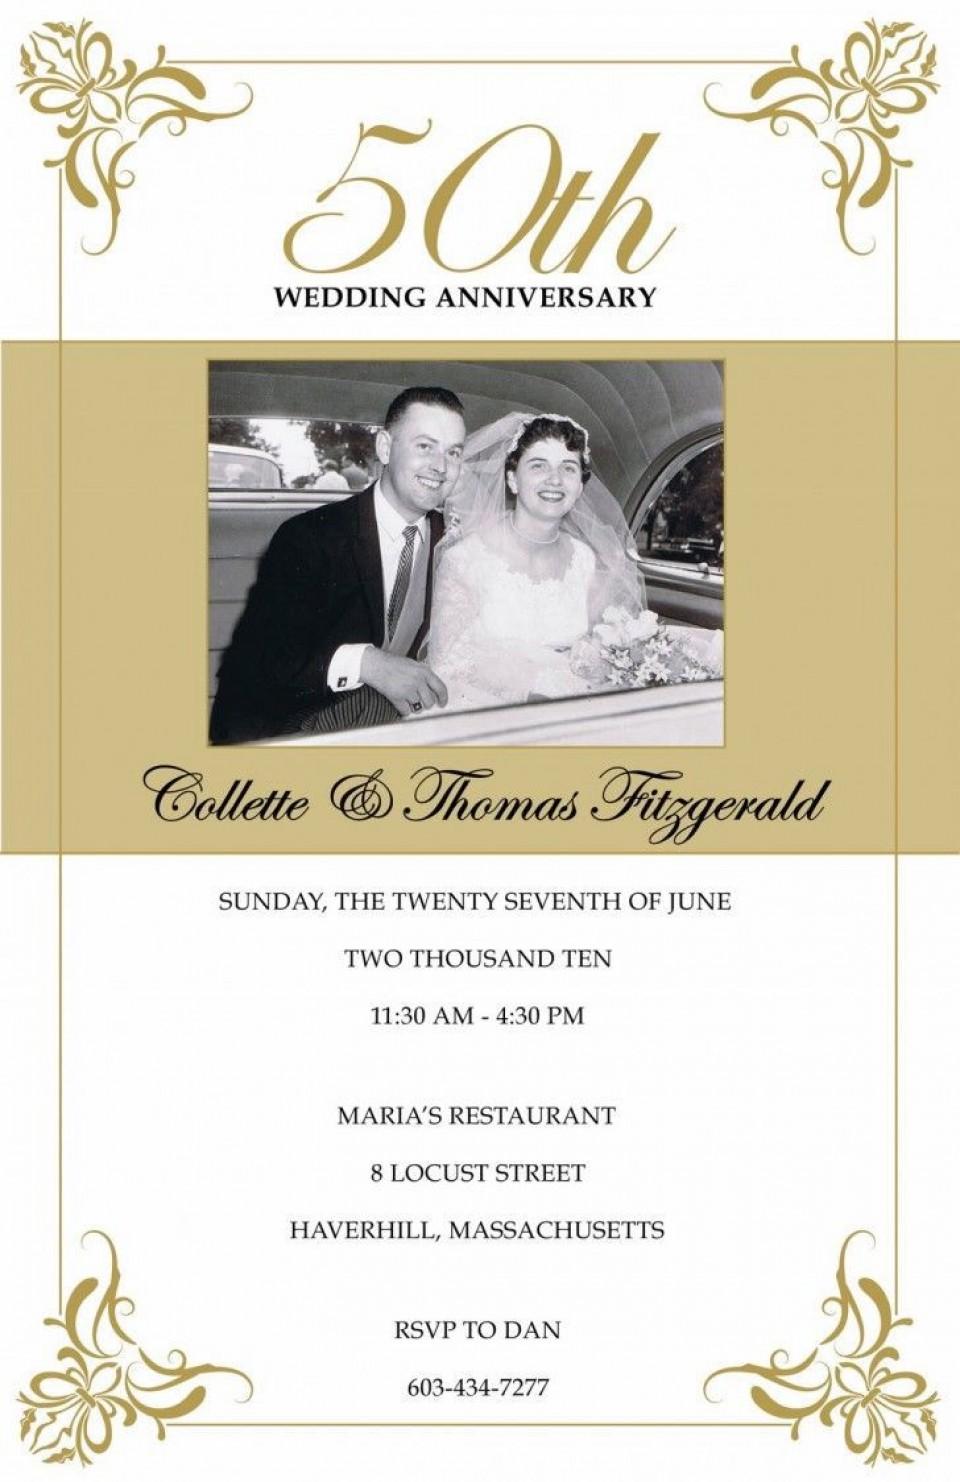 008 Wonderful Free Printable 50th Wedding Anniversary Invitation Template Image 960